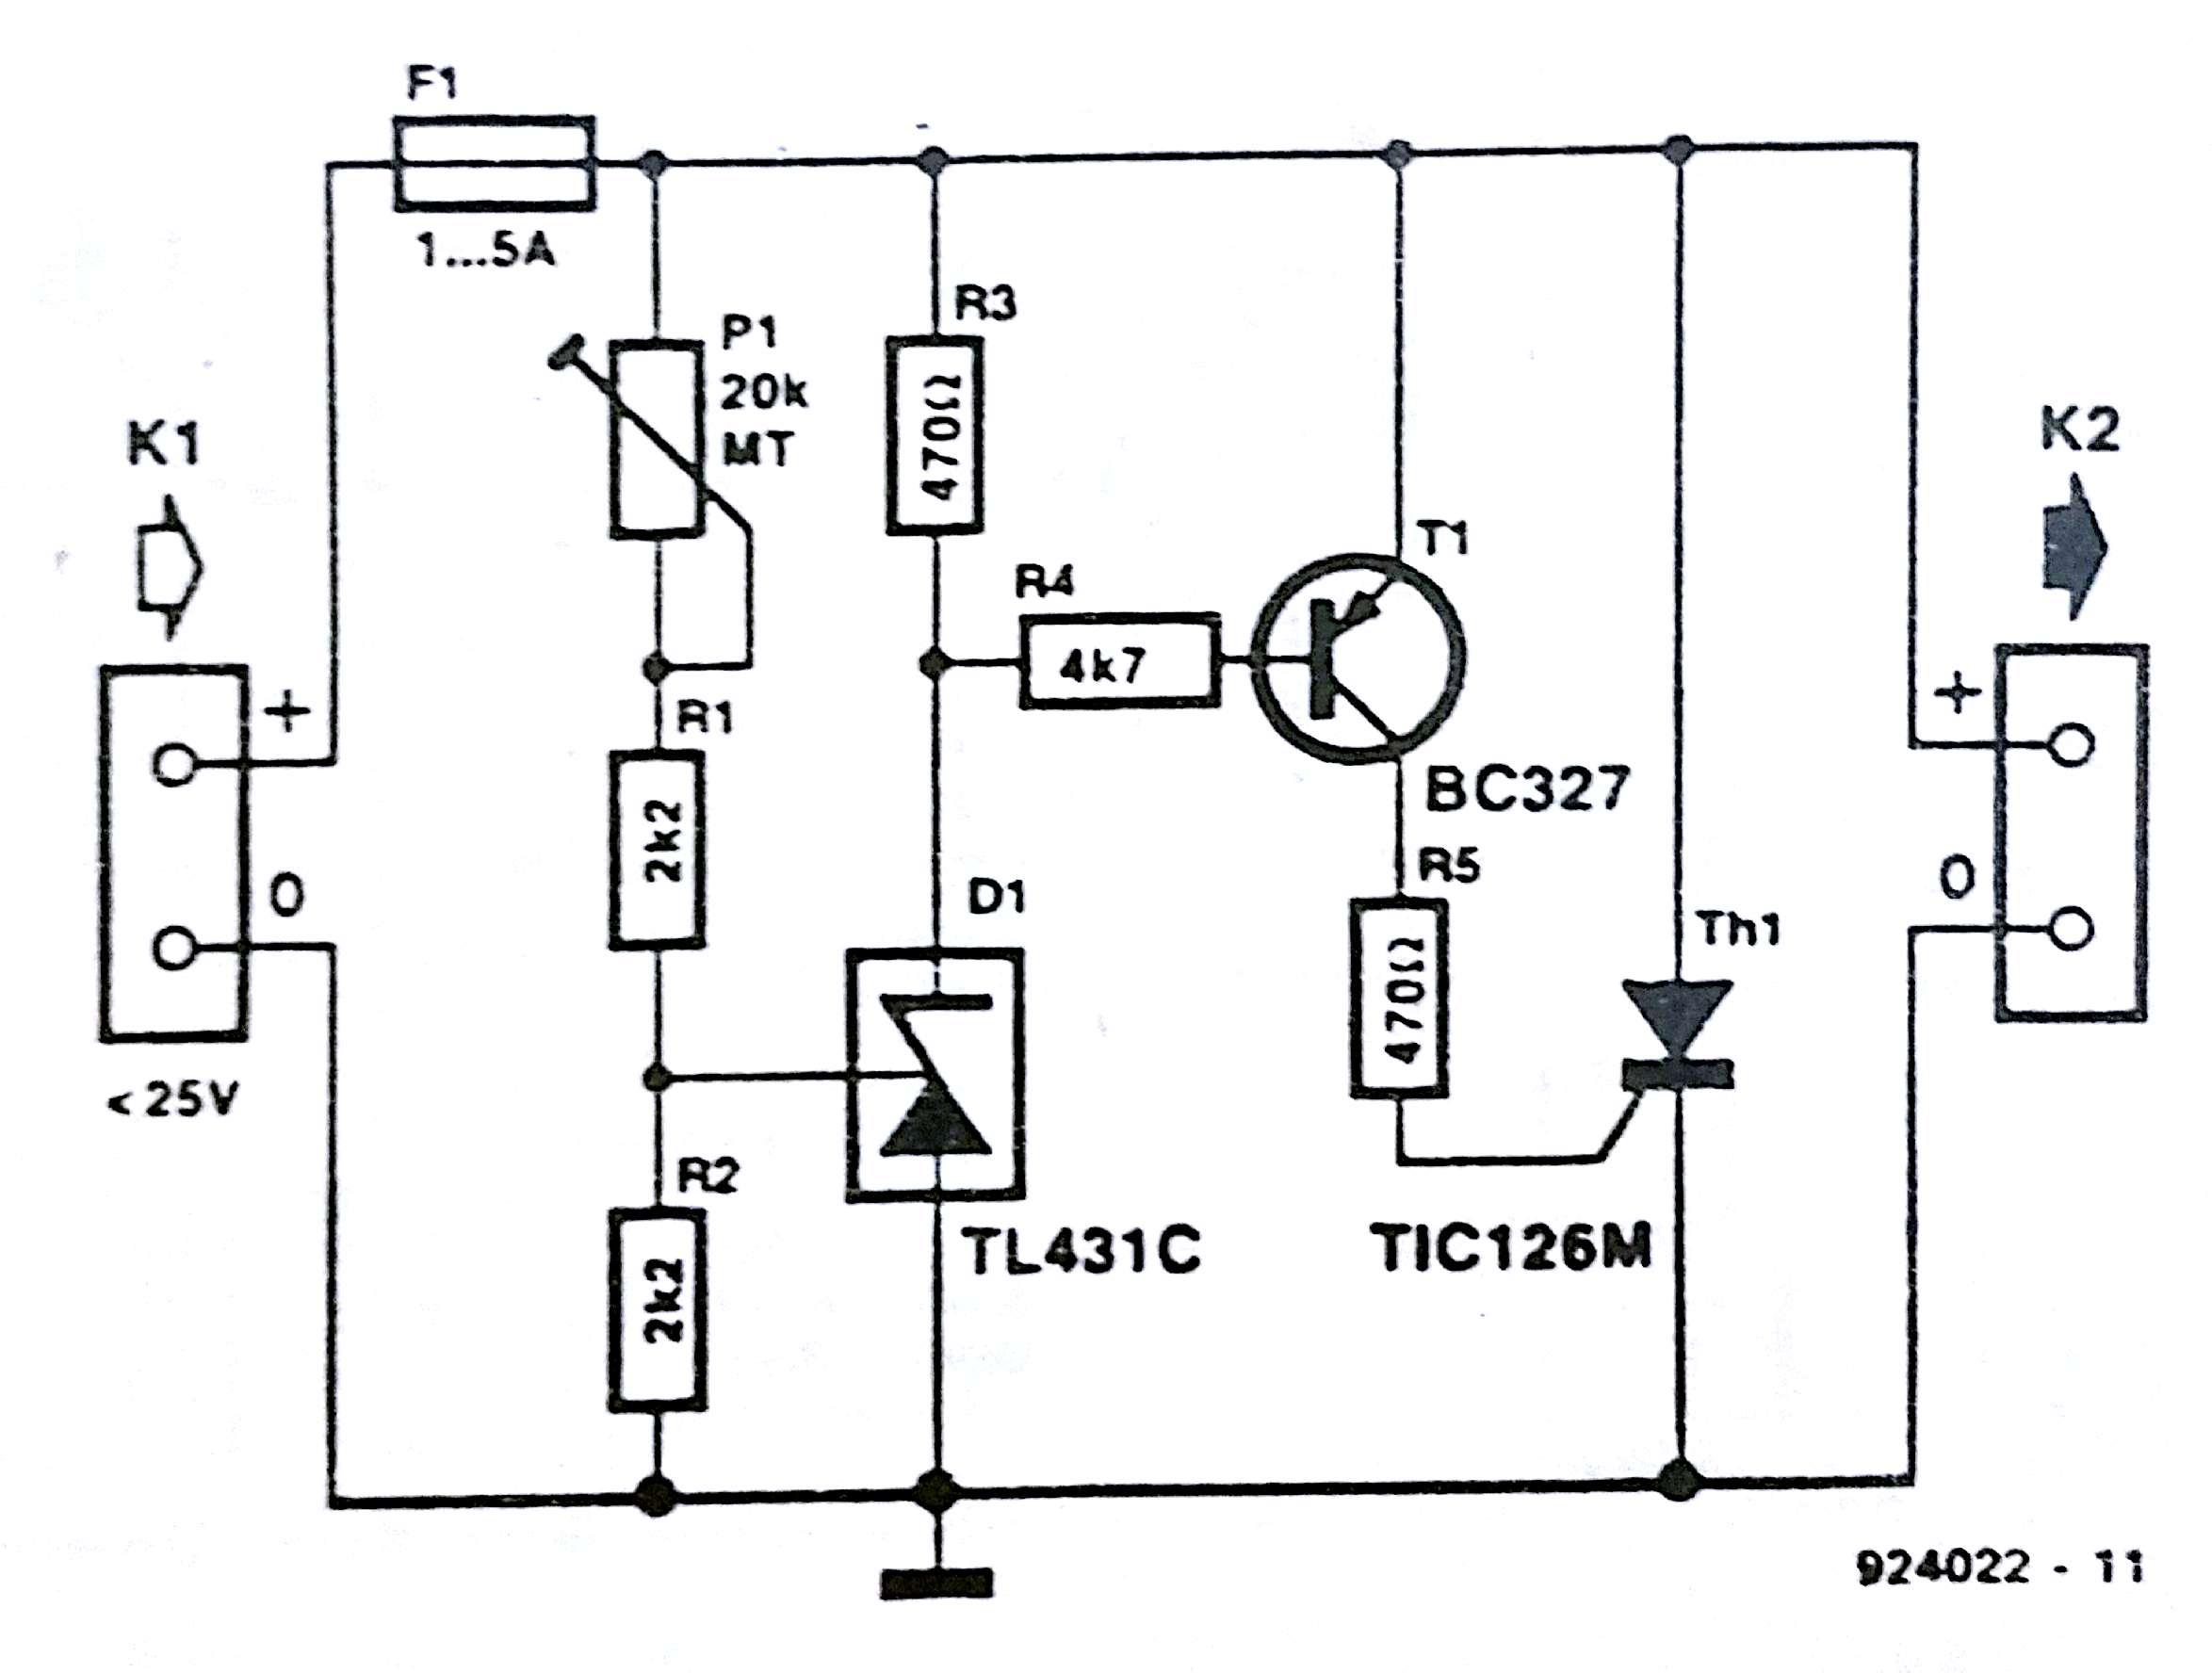 crowbar over voltage protection circuit diagram rh circuit diagramz com Residential Electrical Wiring Diagrams Basic Electrical Wiring Diagrams